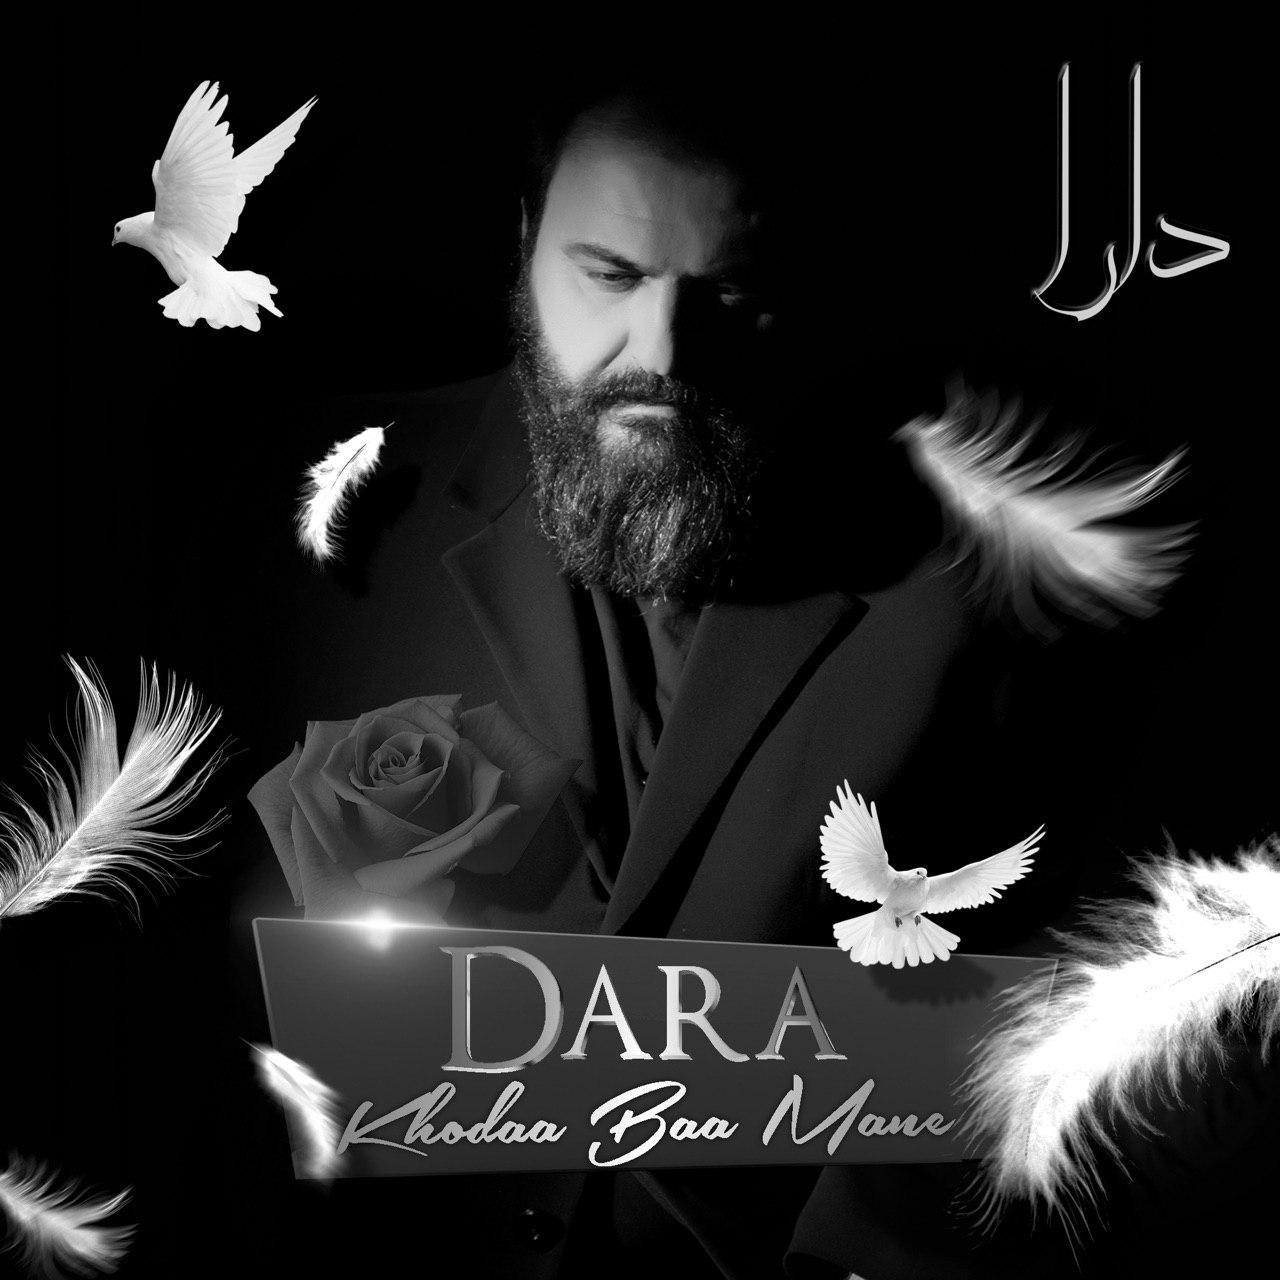 Dara Recording Artist – Khoda Ba Mane